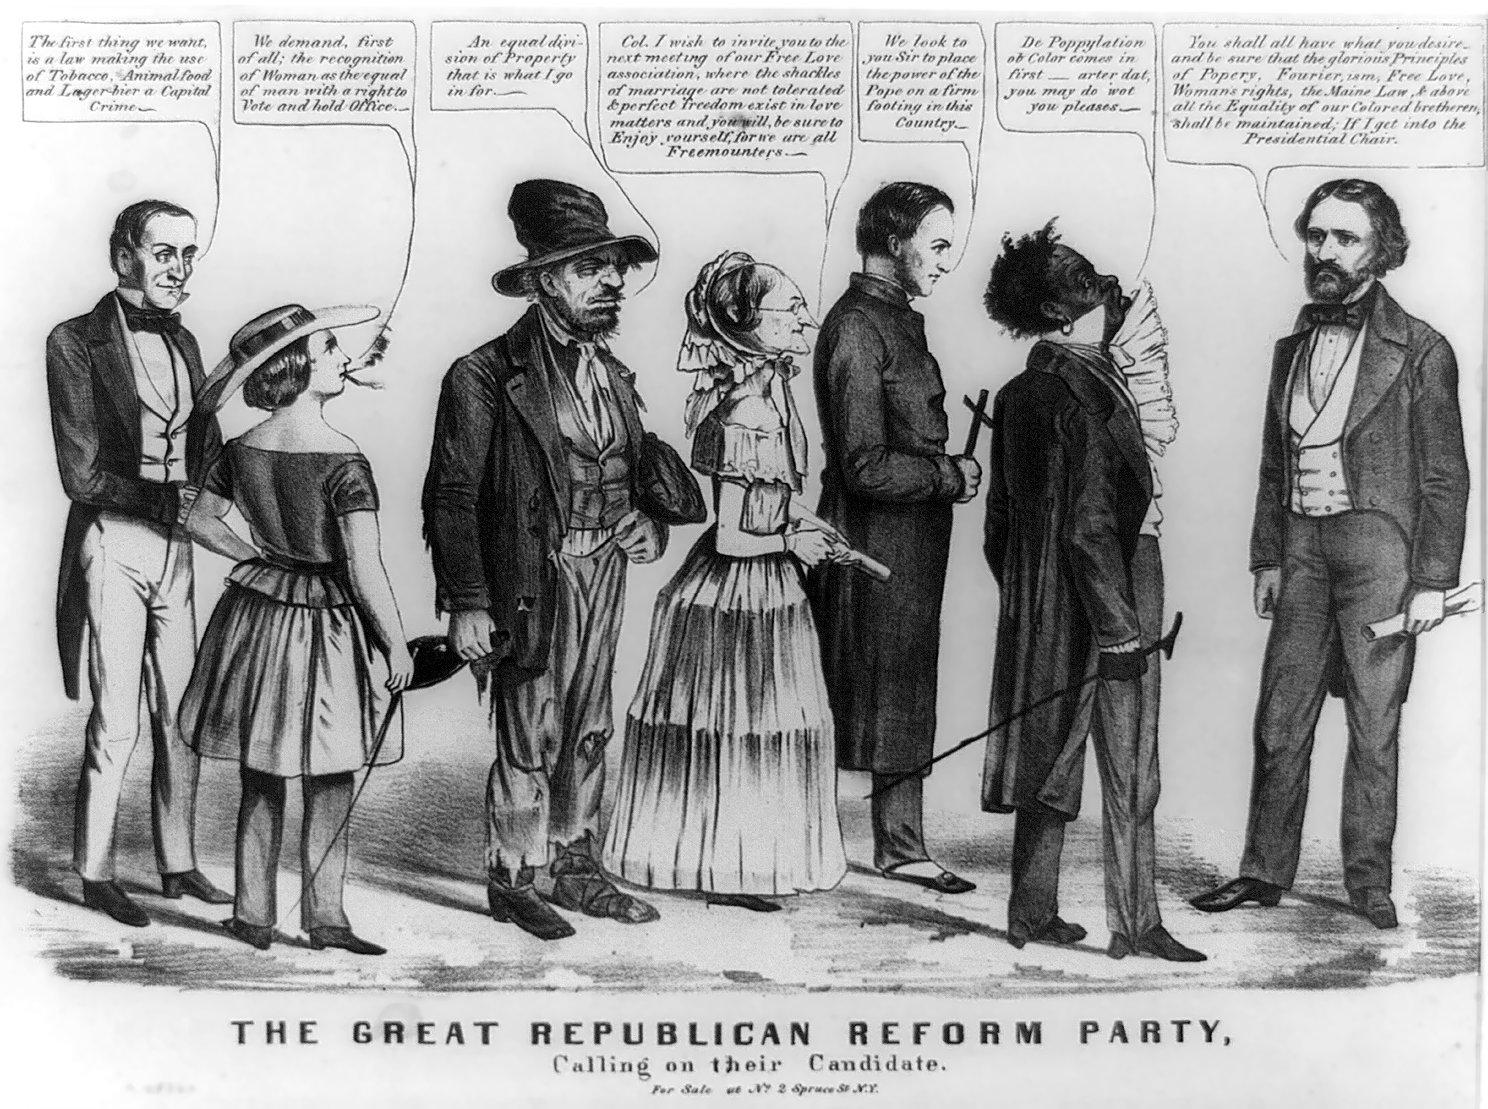 Its hard being a Republican maverick